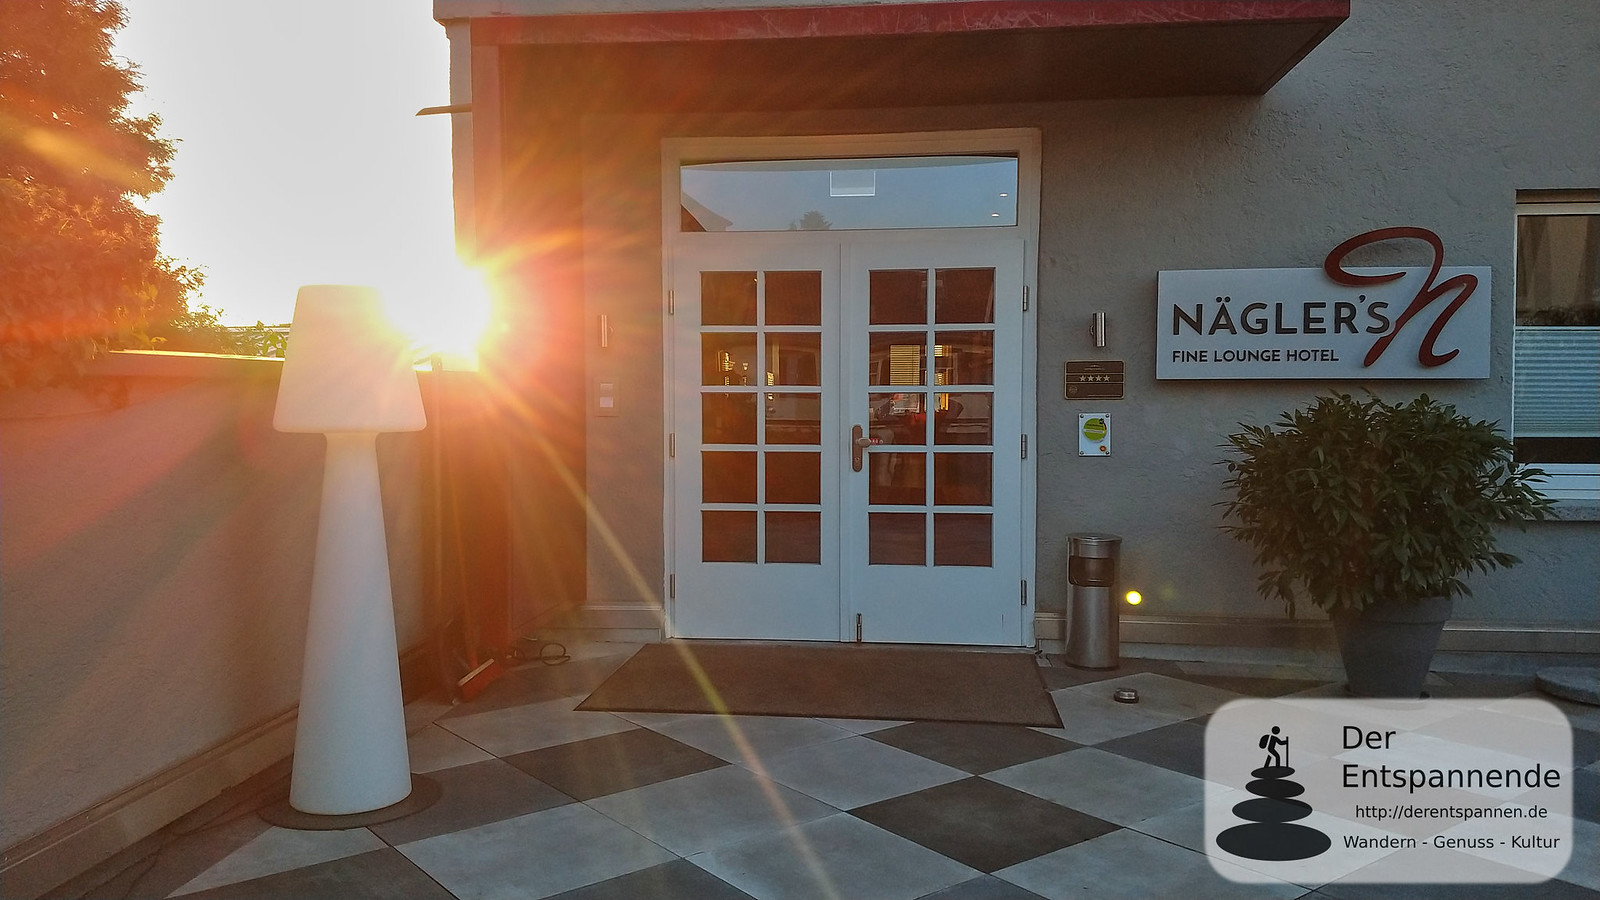 Zurück in Nägler's Fine Lounge Hotel vom SunriseRun